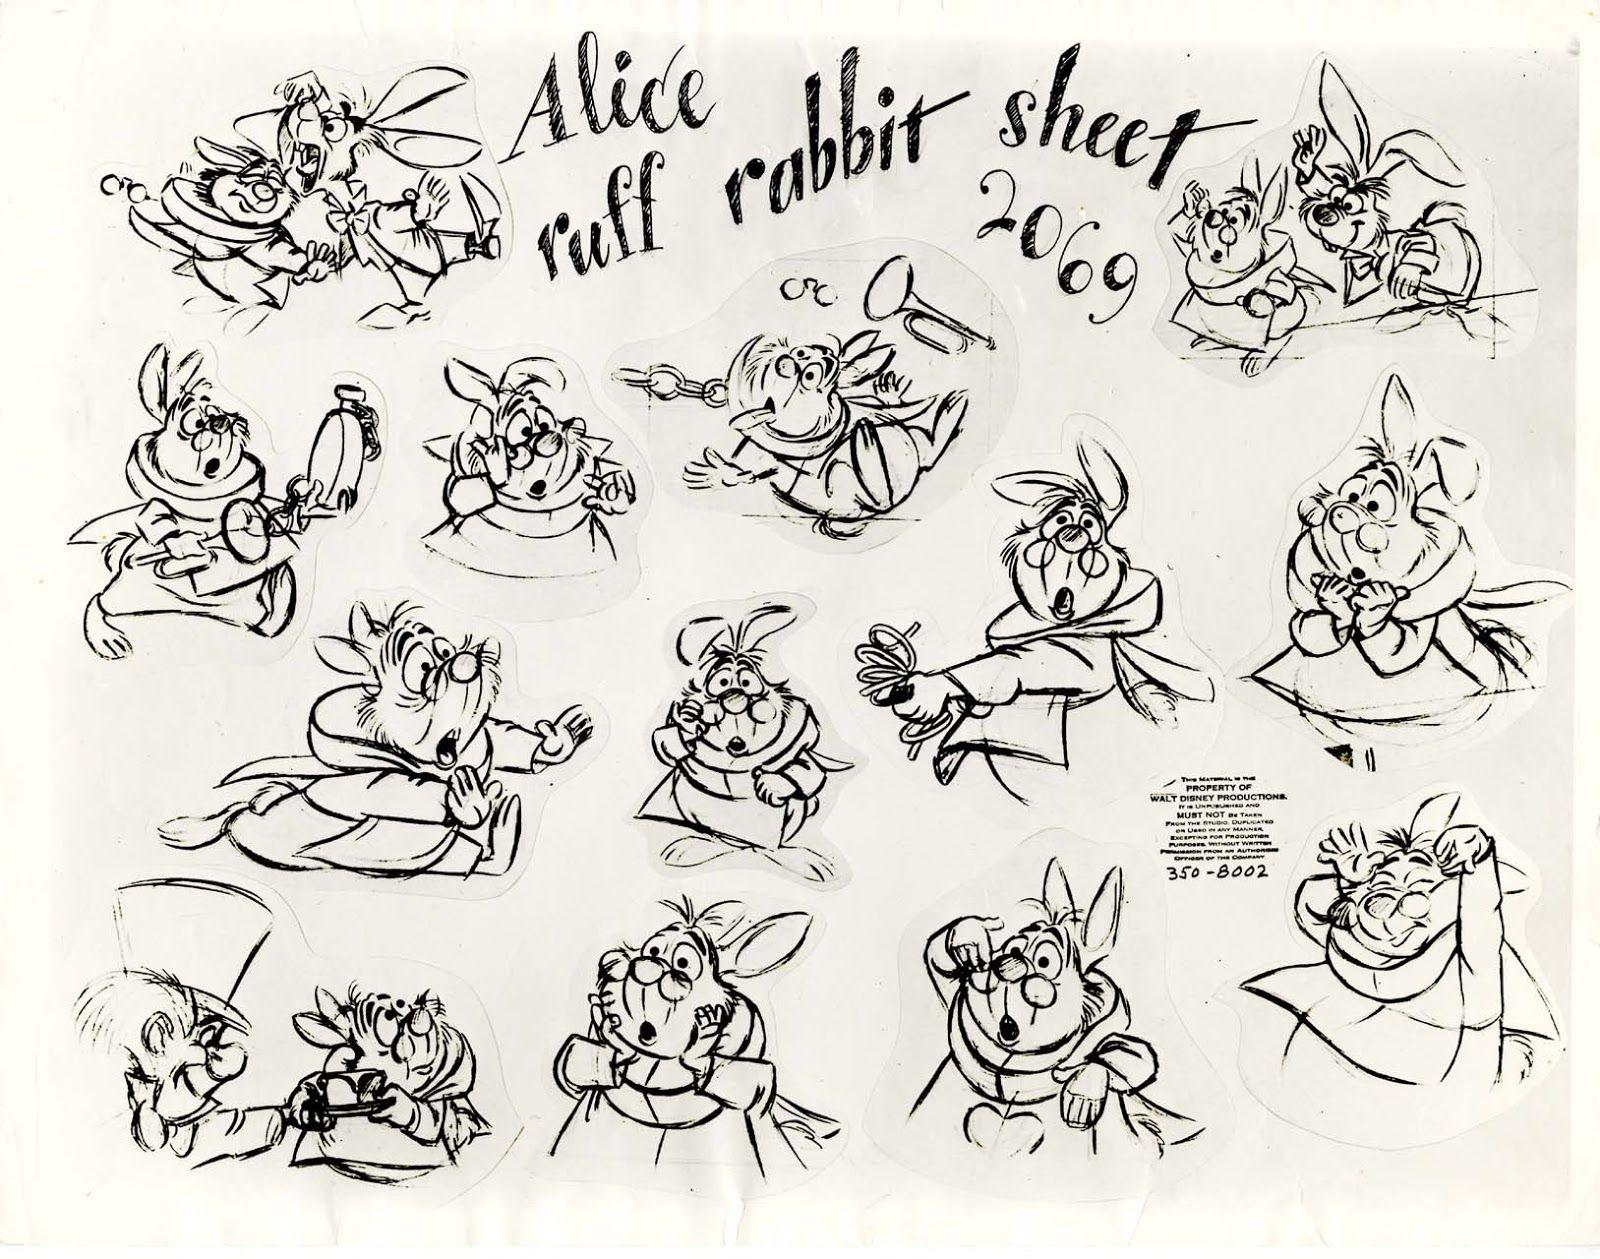 Vintage Disney Alice in Wonderland: Animation Model Sheet 350-8002 - Ruff Rabbit